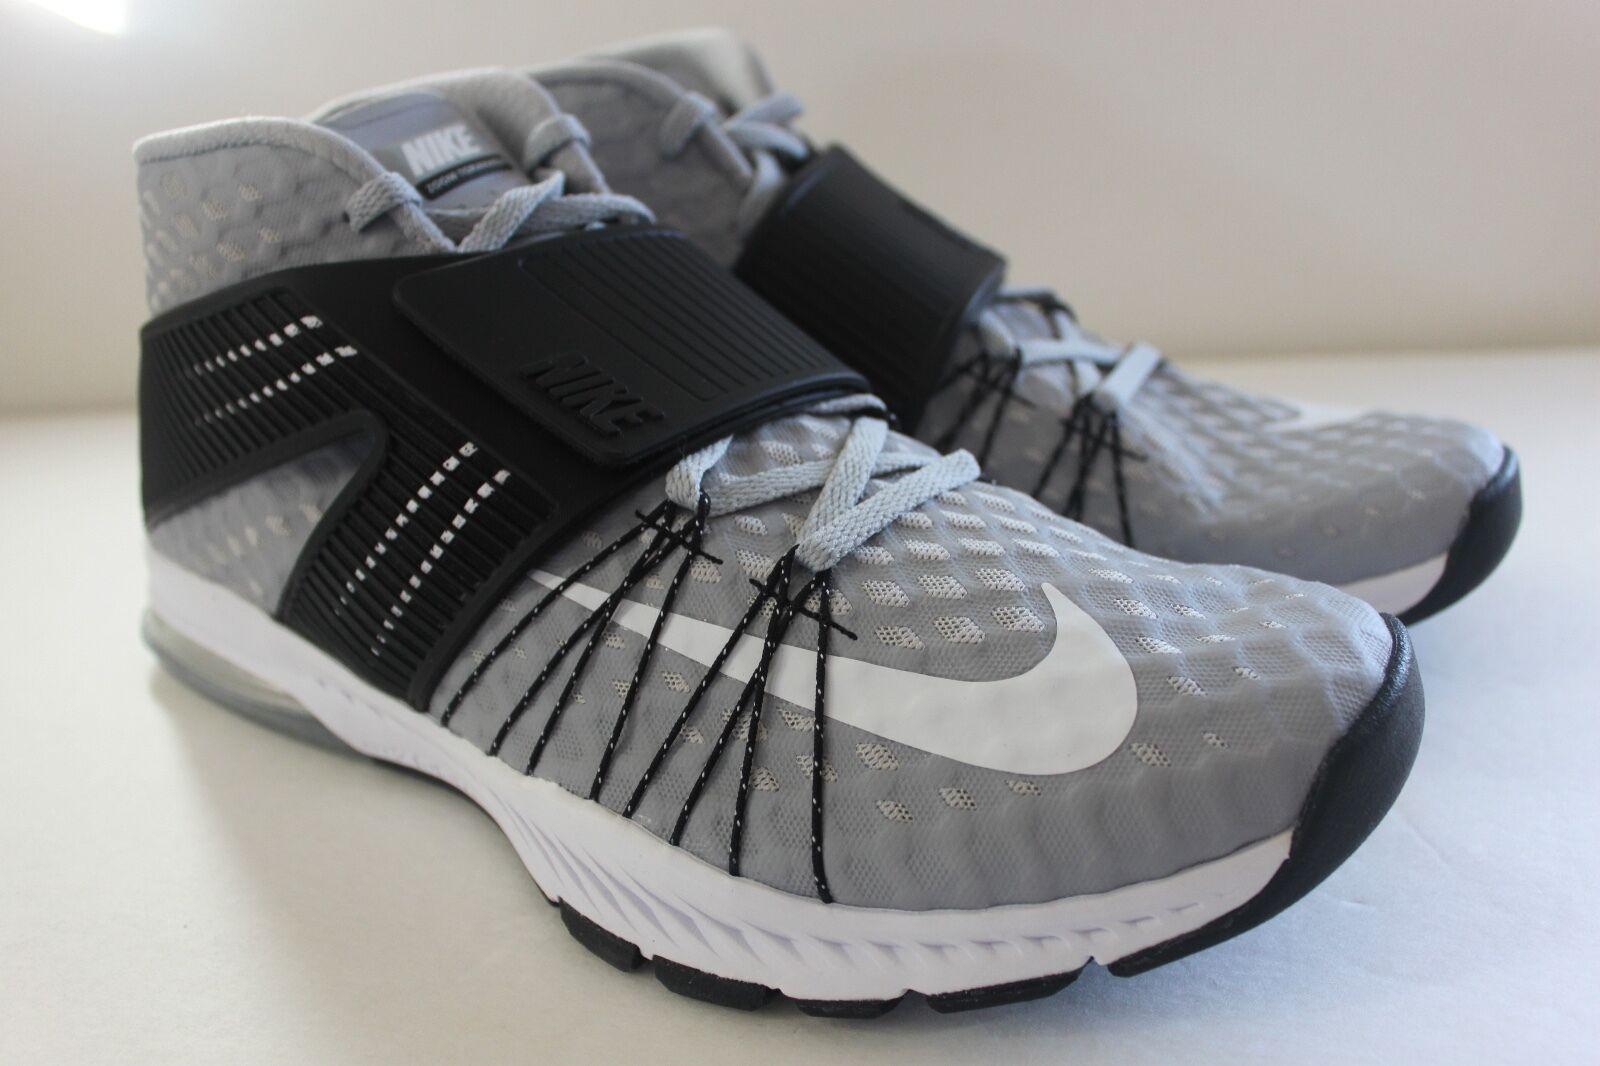 Uomo Nike Zoom Train Tornado TB Training & Gym Shoe  Grey Size 11 M